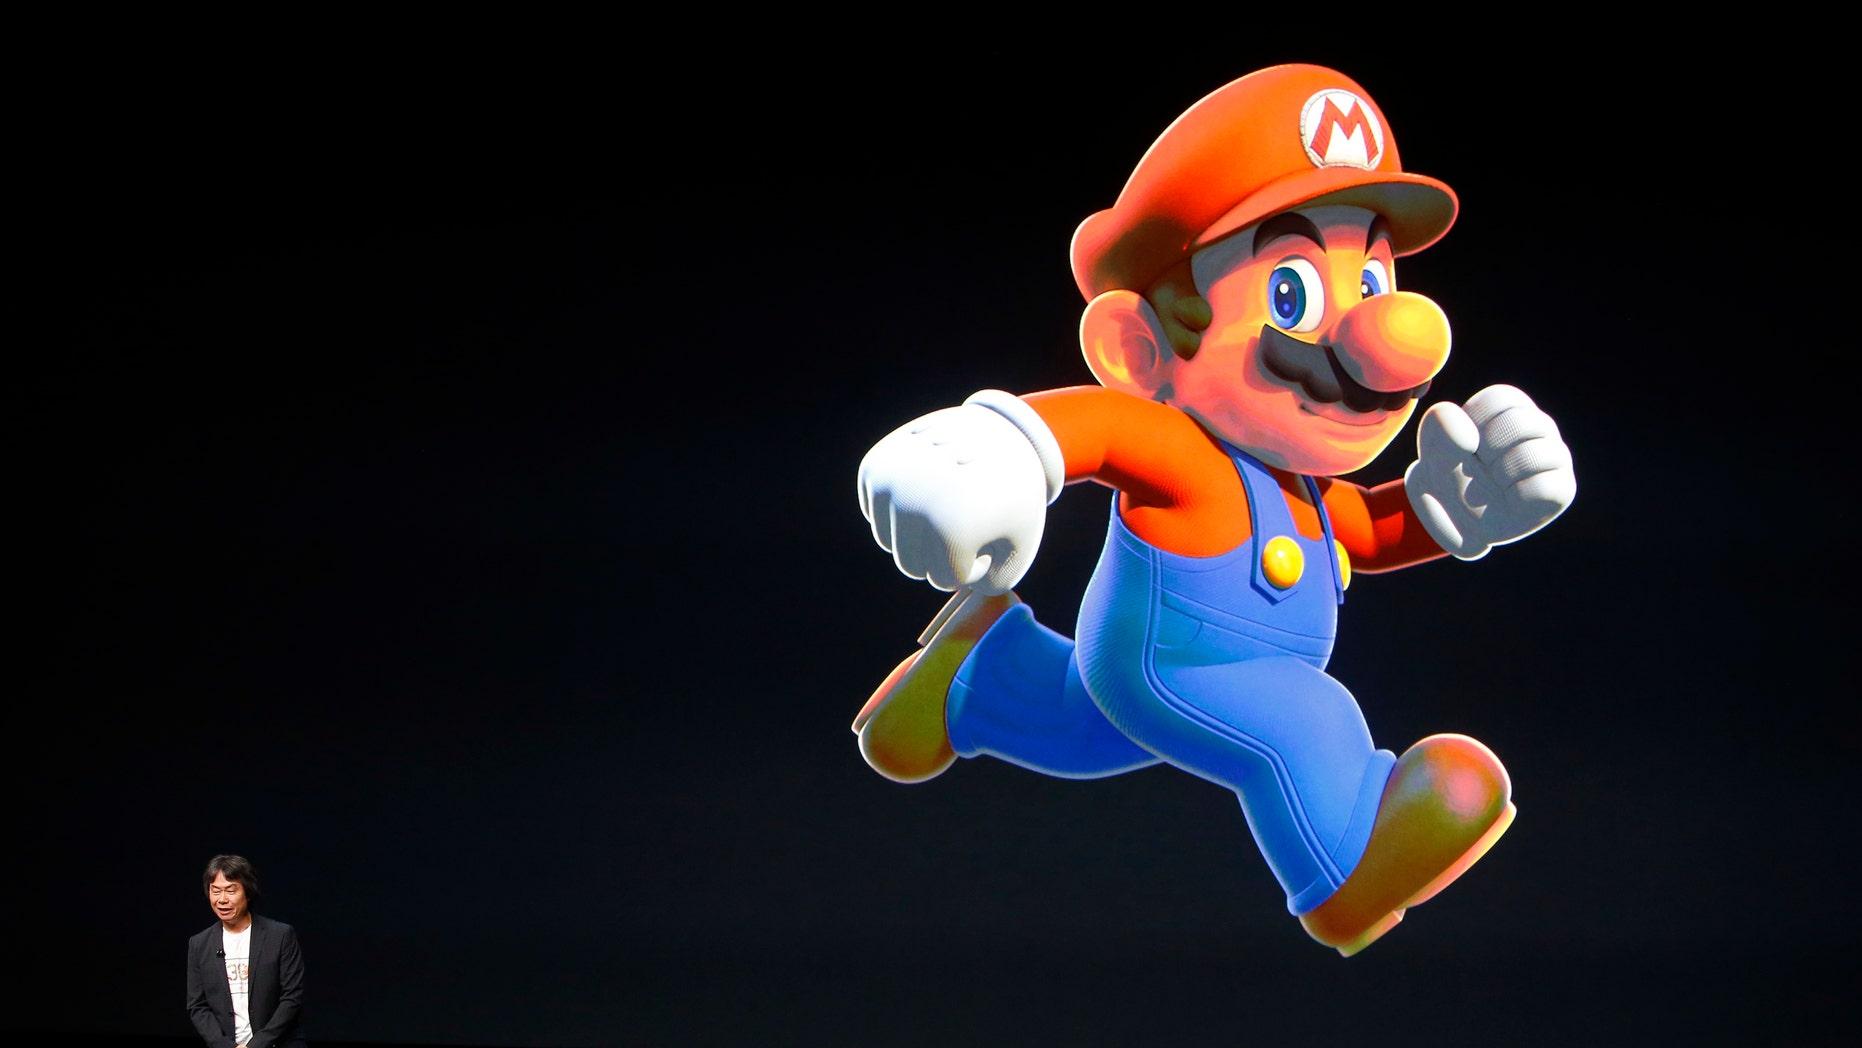 Nintendo Creative Fellow Shigeru Miyamoto stands next to the Super Mario character during an Apple media event in San Francisco, California, U.S. September 7, 2016.